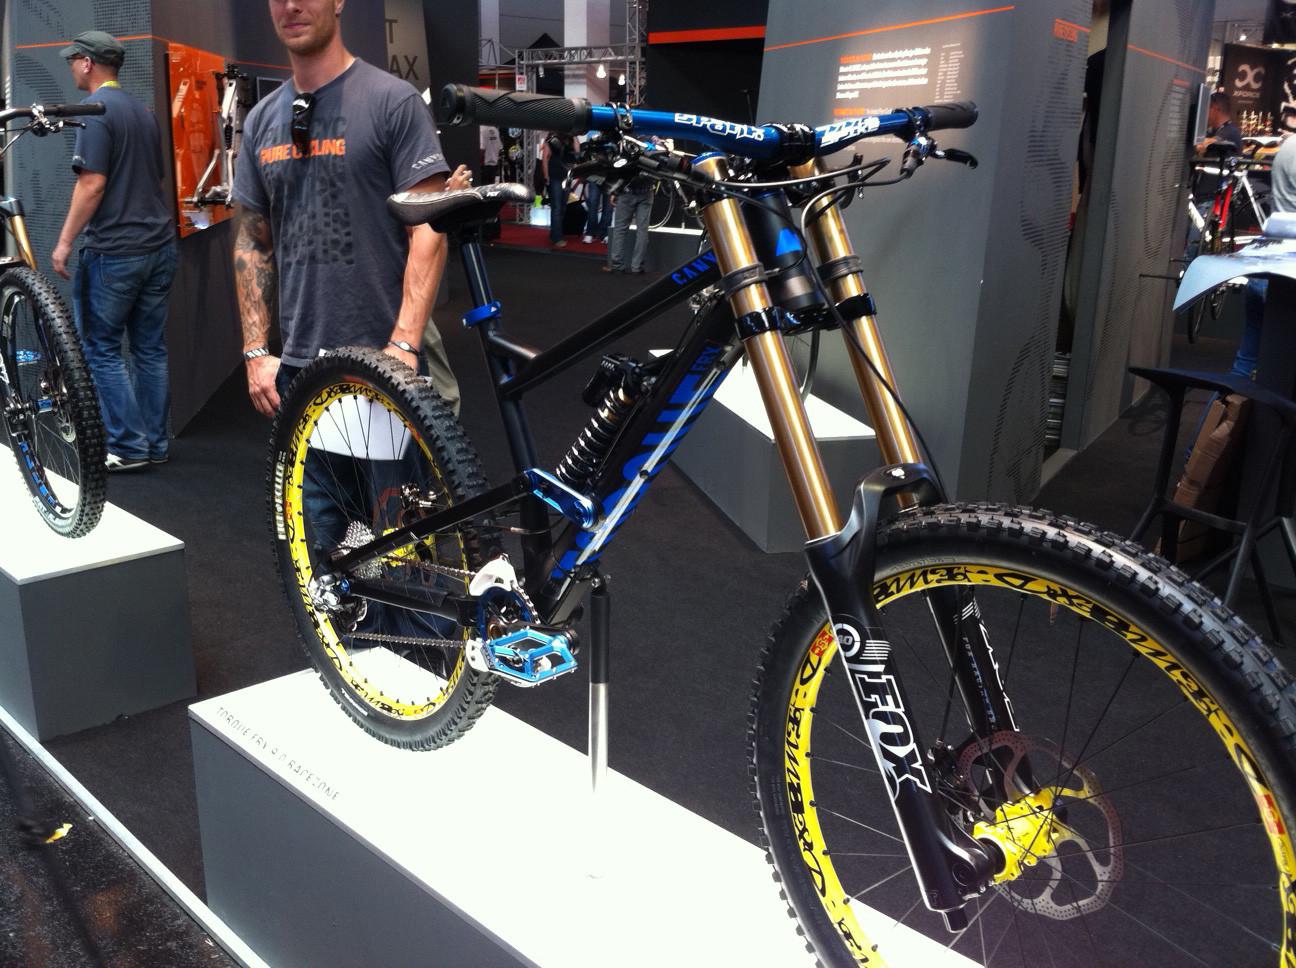 Canyon Torque FRX 9.0 Race Zone - Eurobike 2011 - Mountain Biking Pictures - Vital MTB